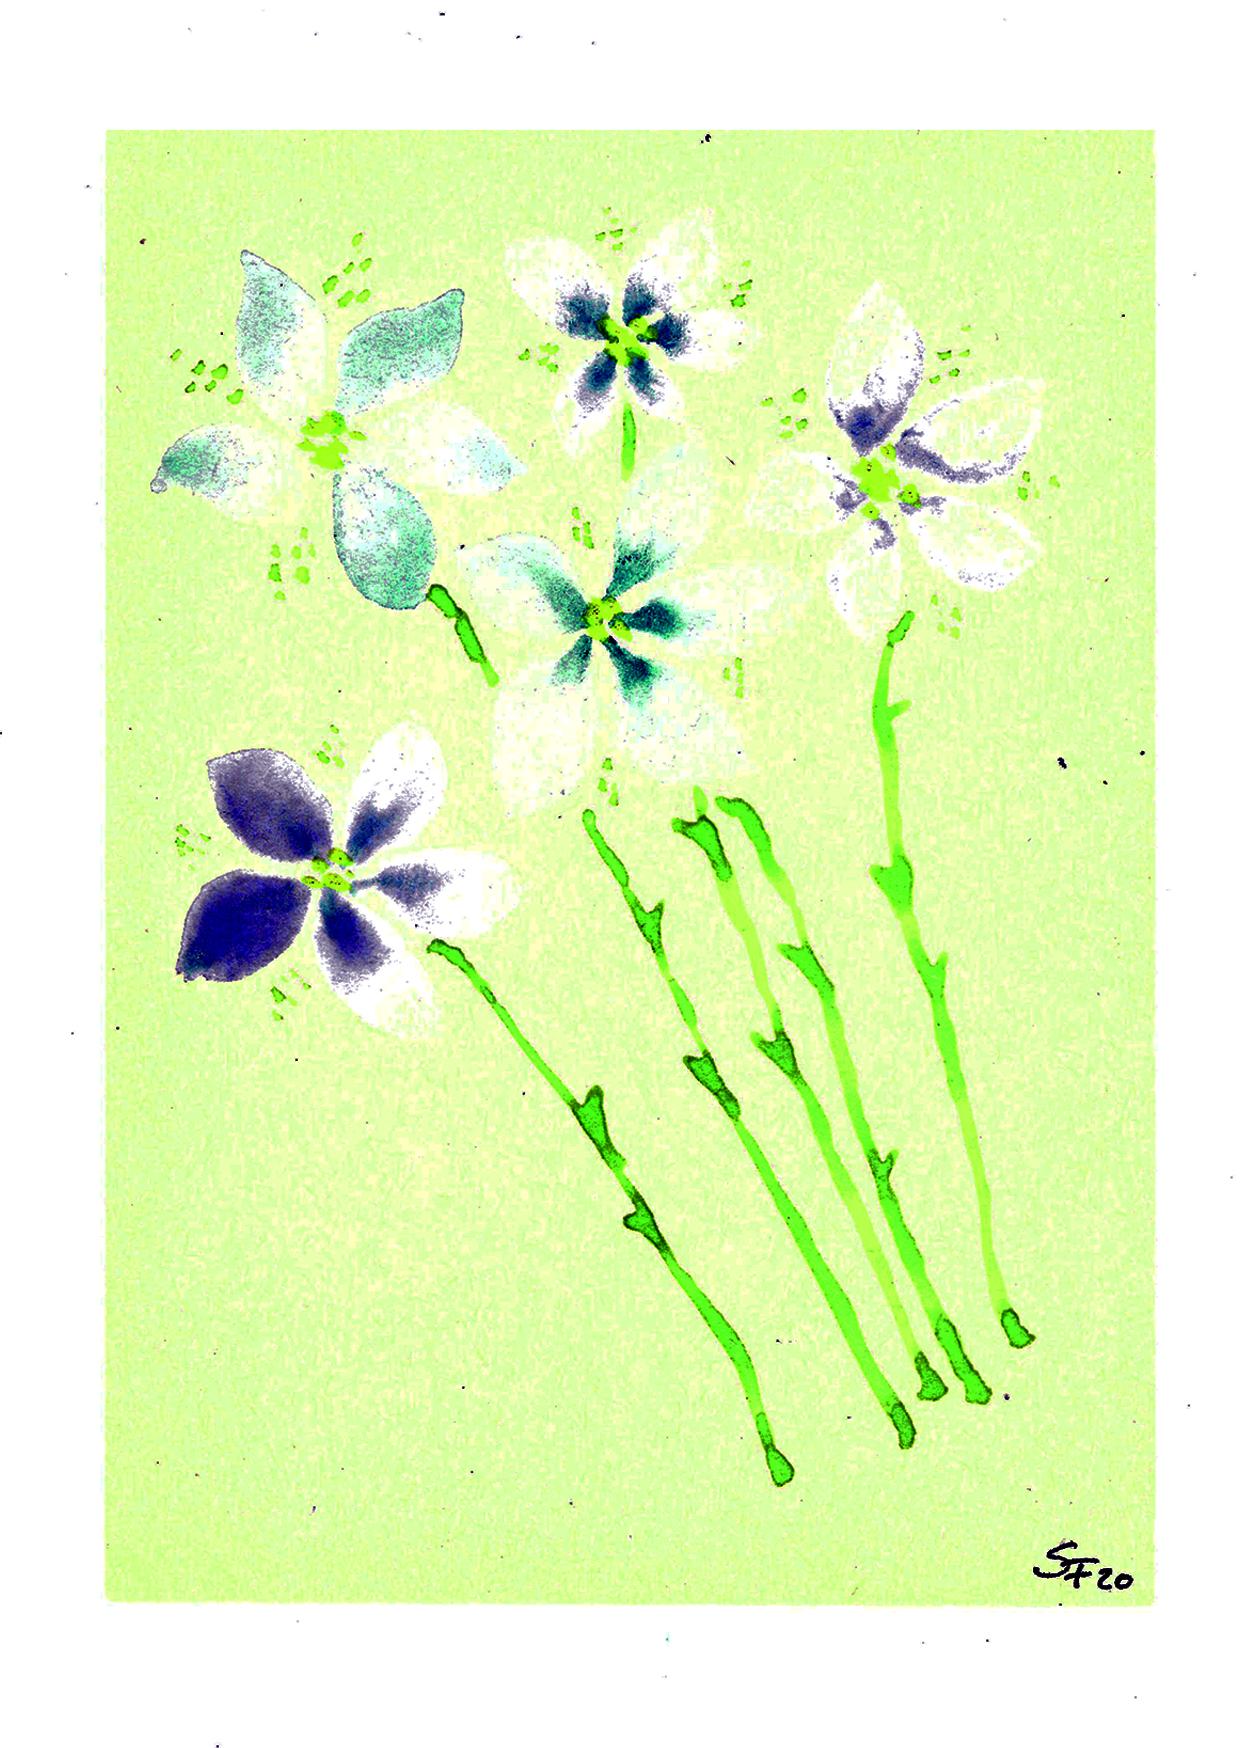 Aquarell blaue Blütenstiele 04/20